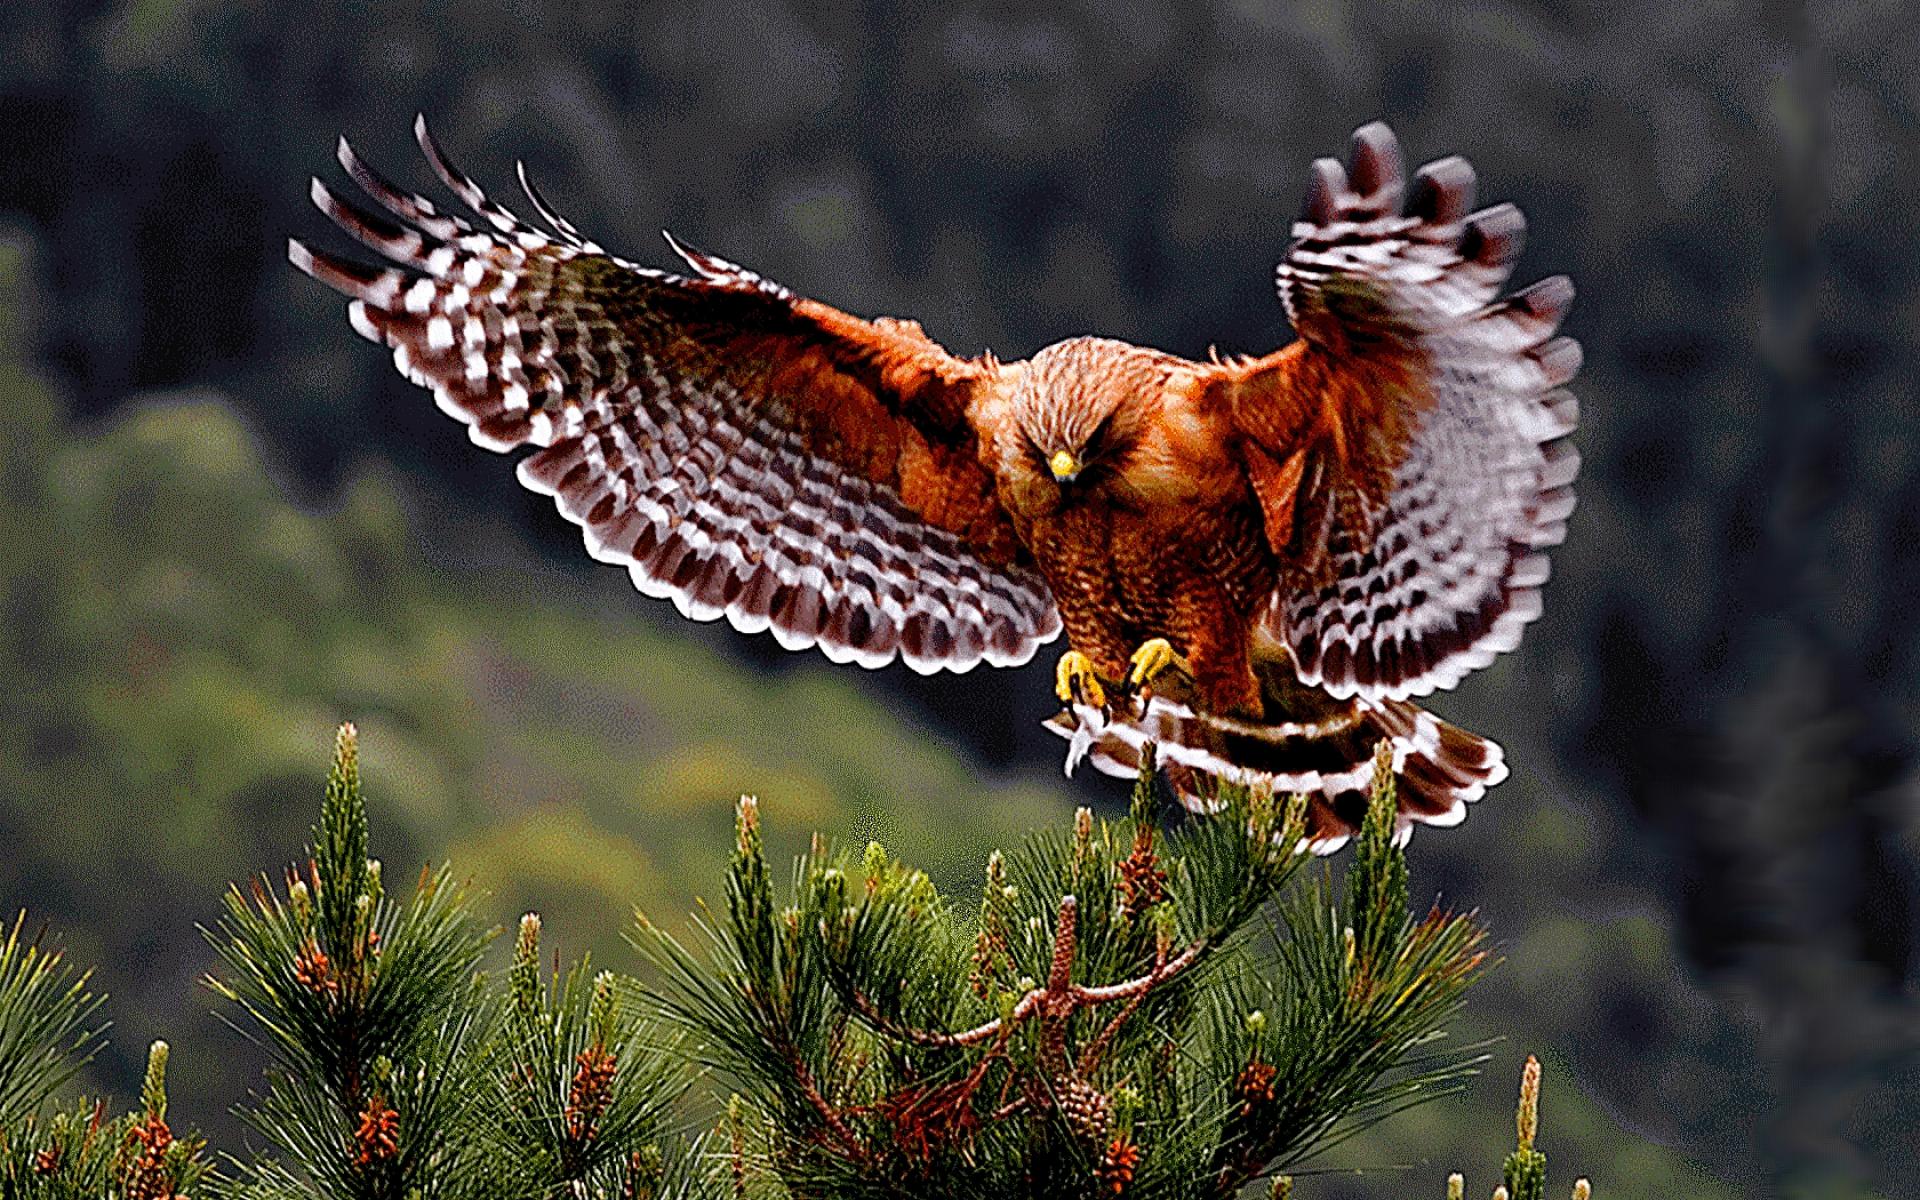 Hd Animal Wallpapers Wild Life Wild Animals High: Exotic Animal Wallpaper